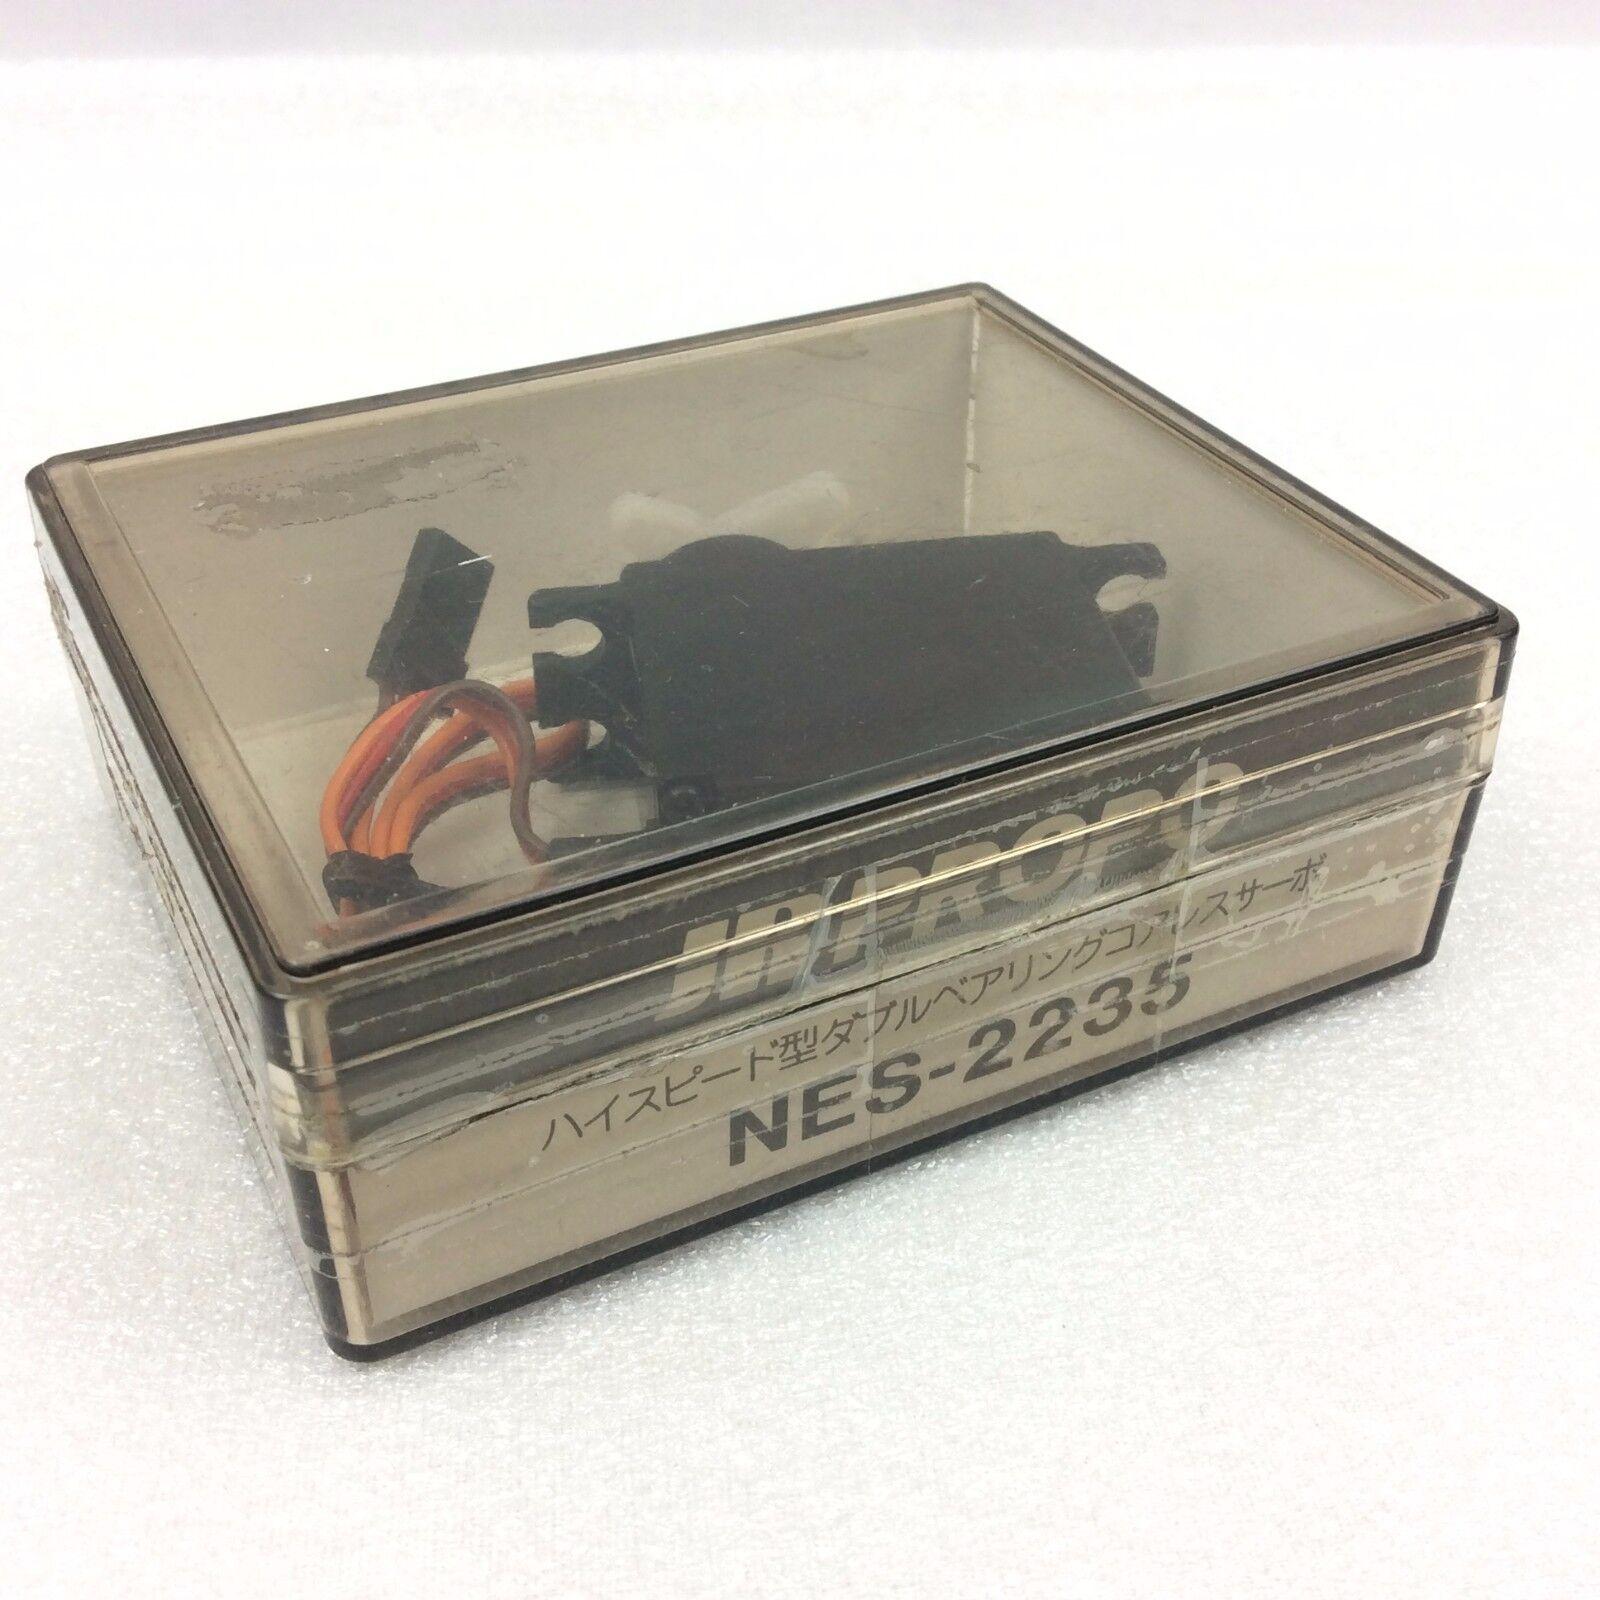 JR NES-2235 SERVO - Made in Japn - rc parts